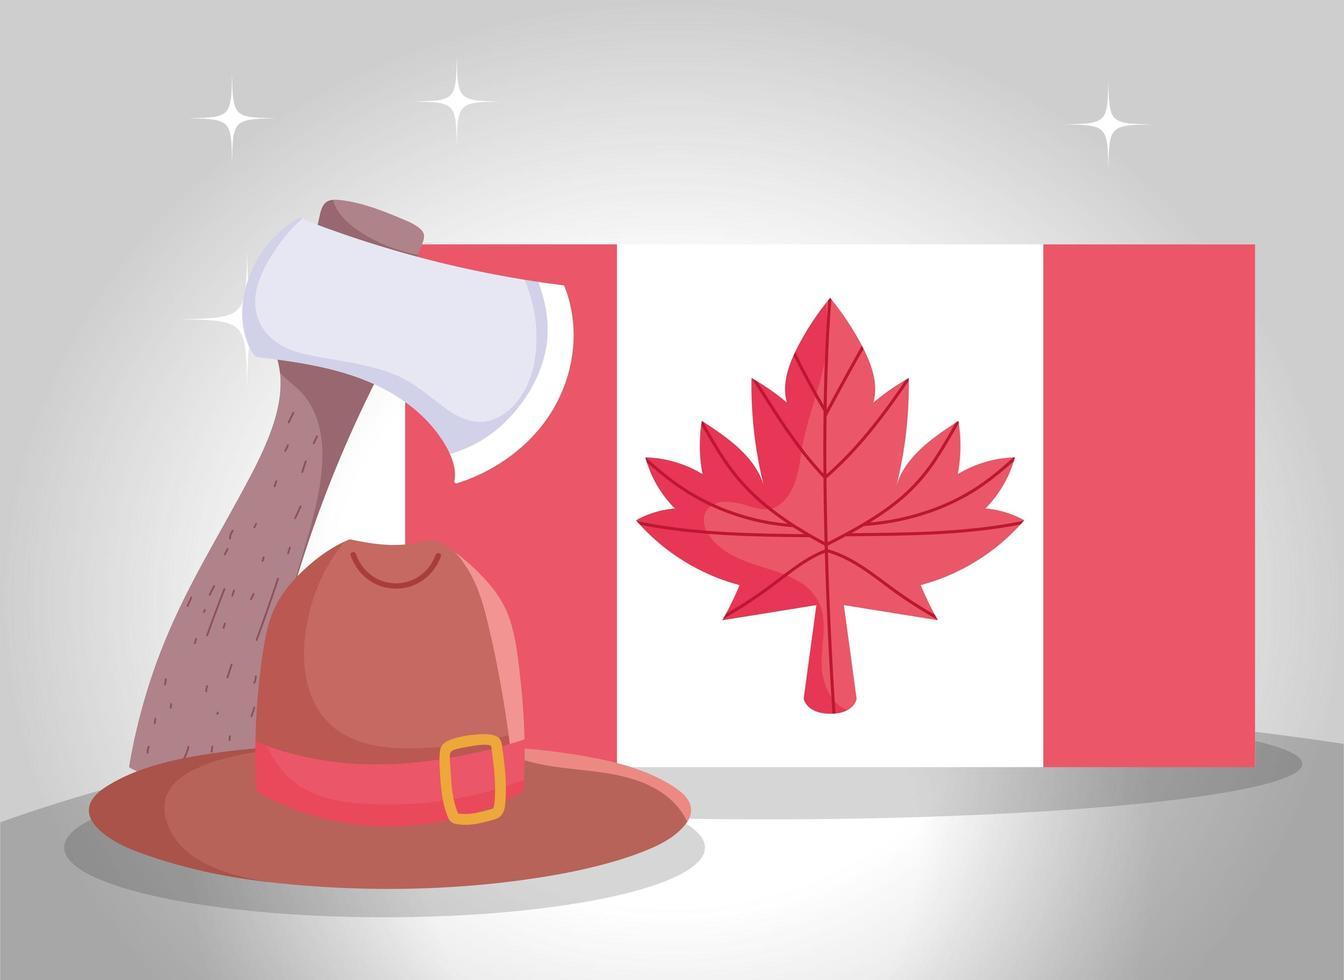 Kanadische Ikonen für Kanada-Tagesfeier vektor